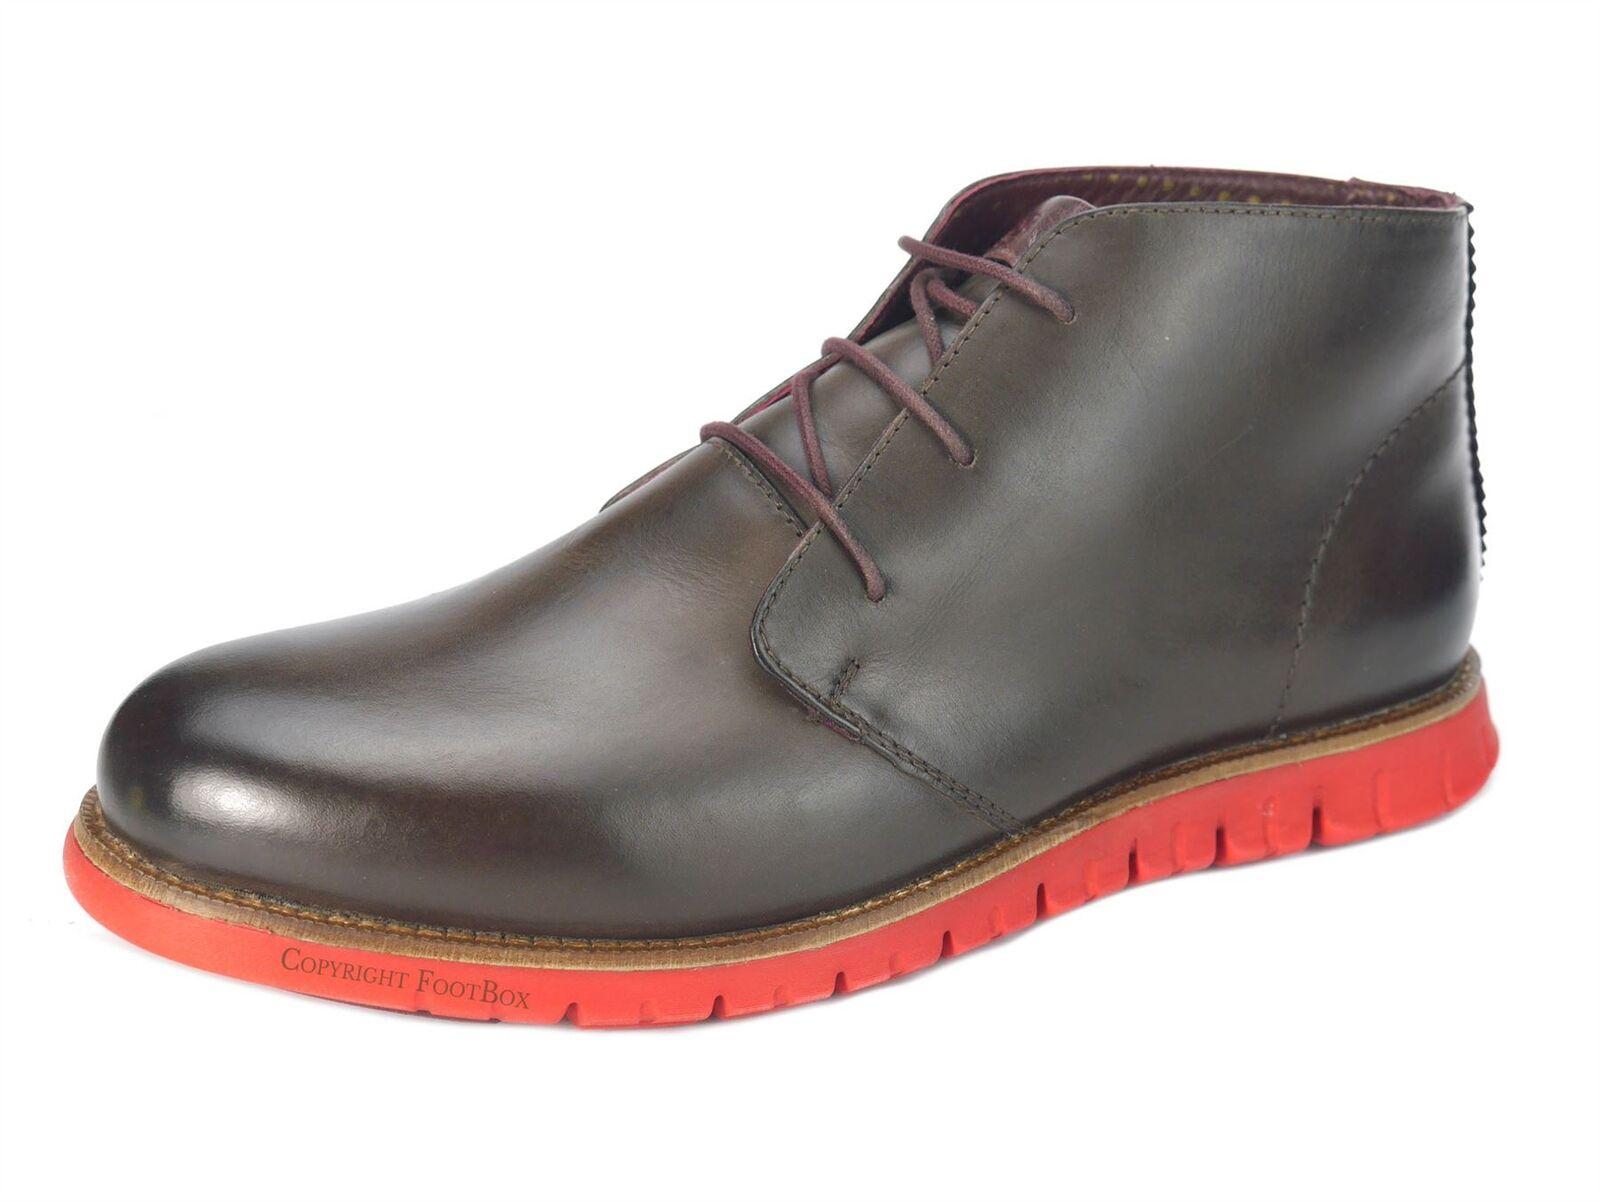 London Brogues GATZ Uomo stivali Casual Chukka ultra leggero stivali Uomo scarpe marroni 27924f